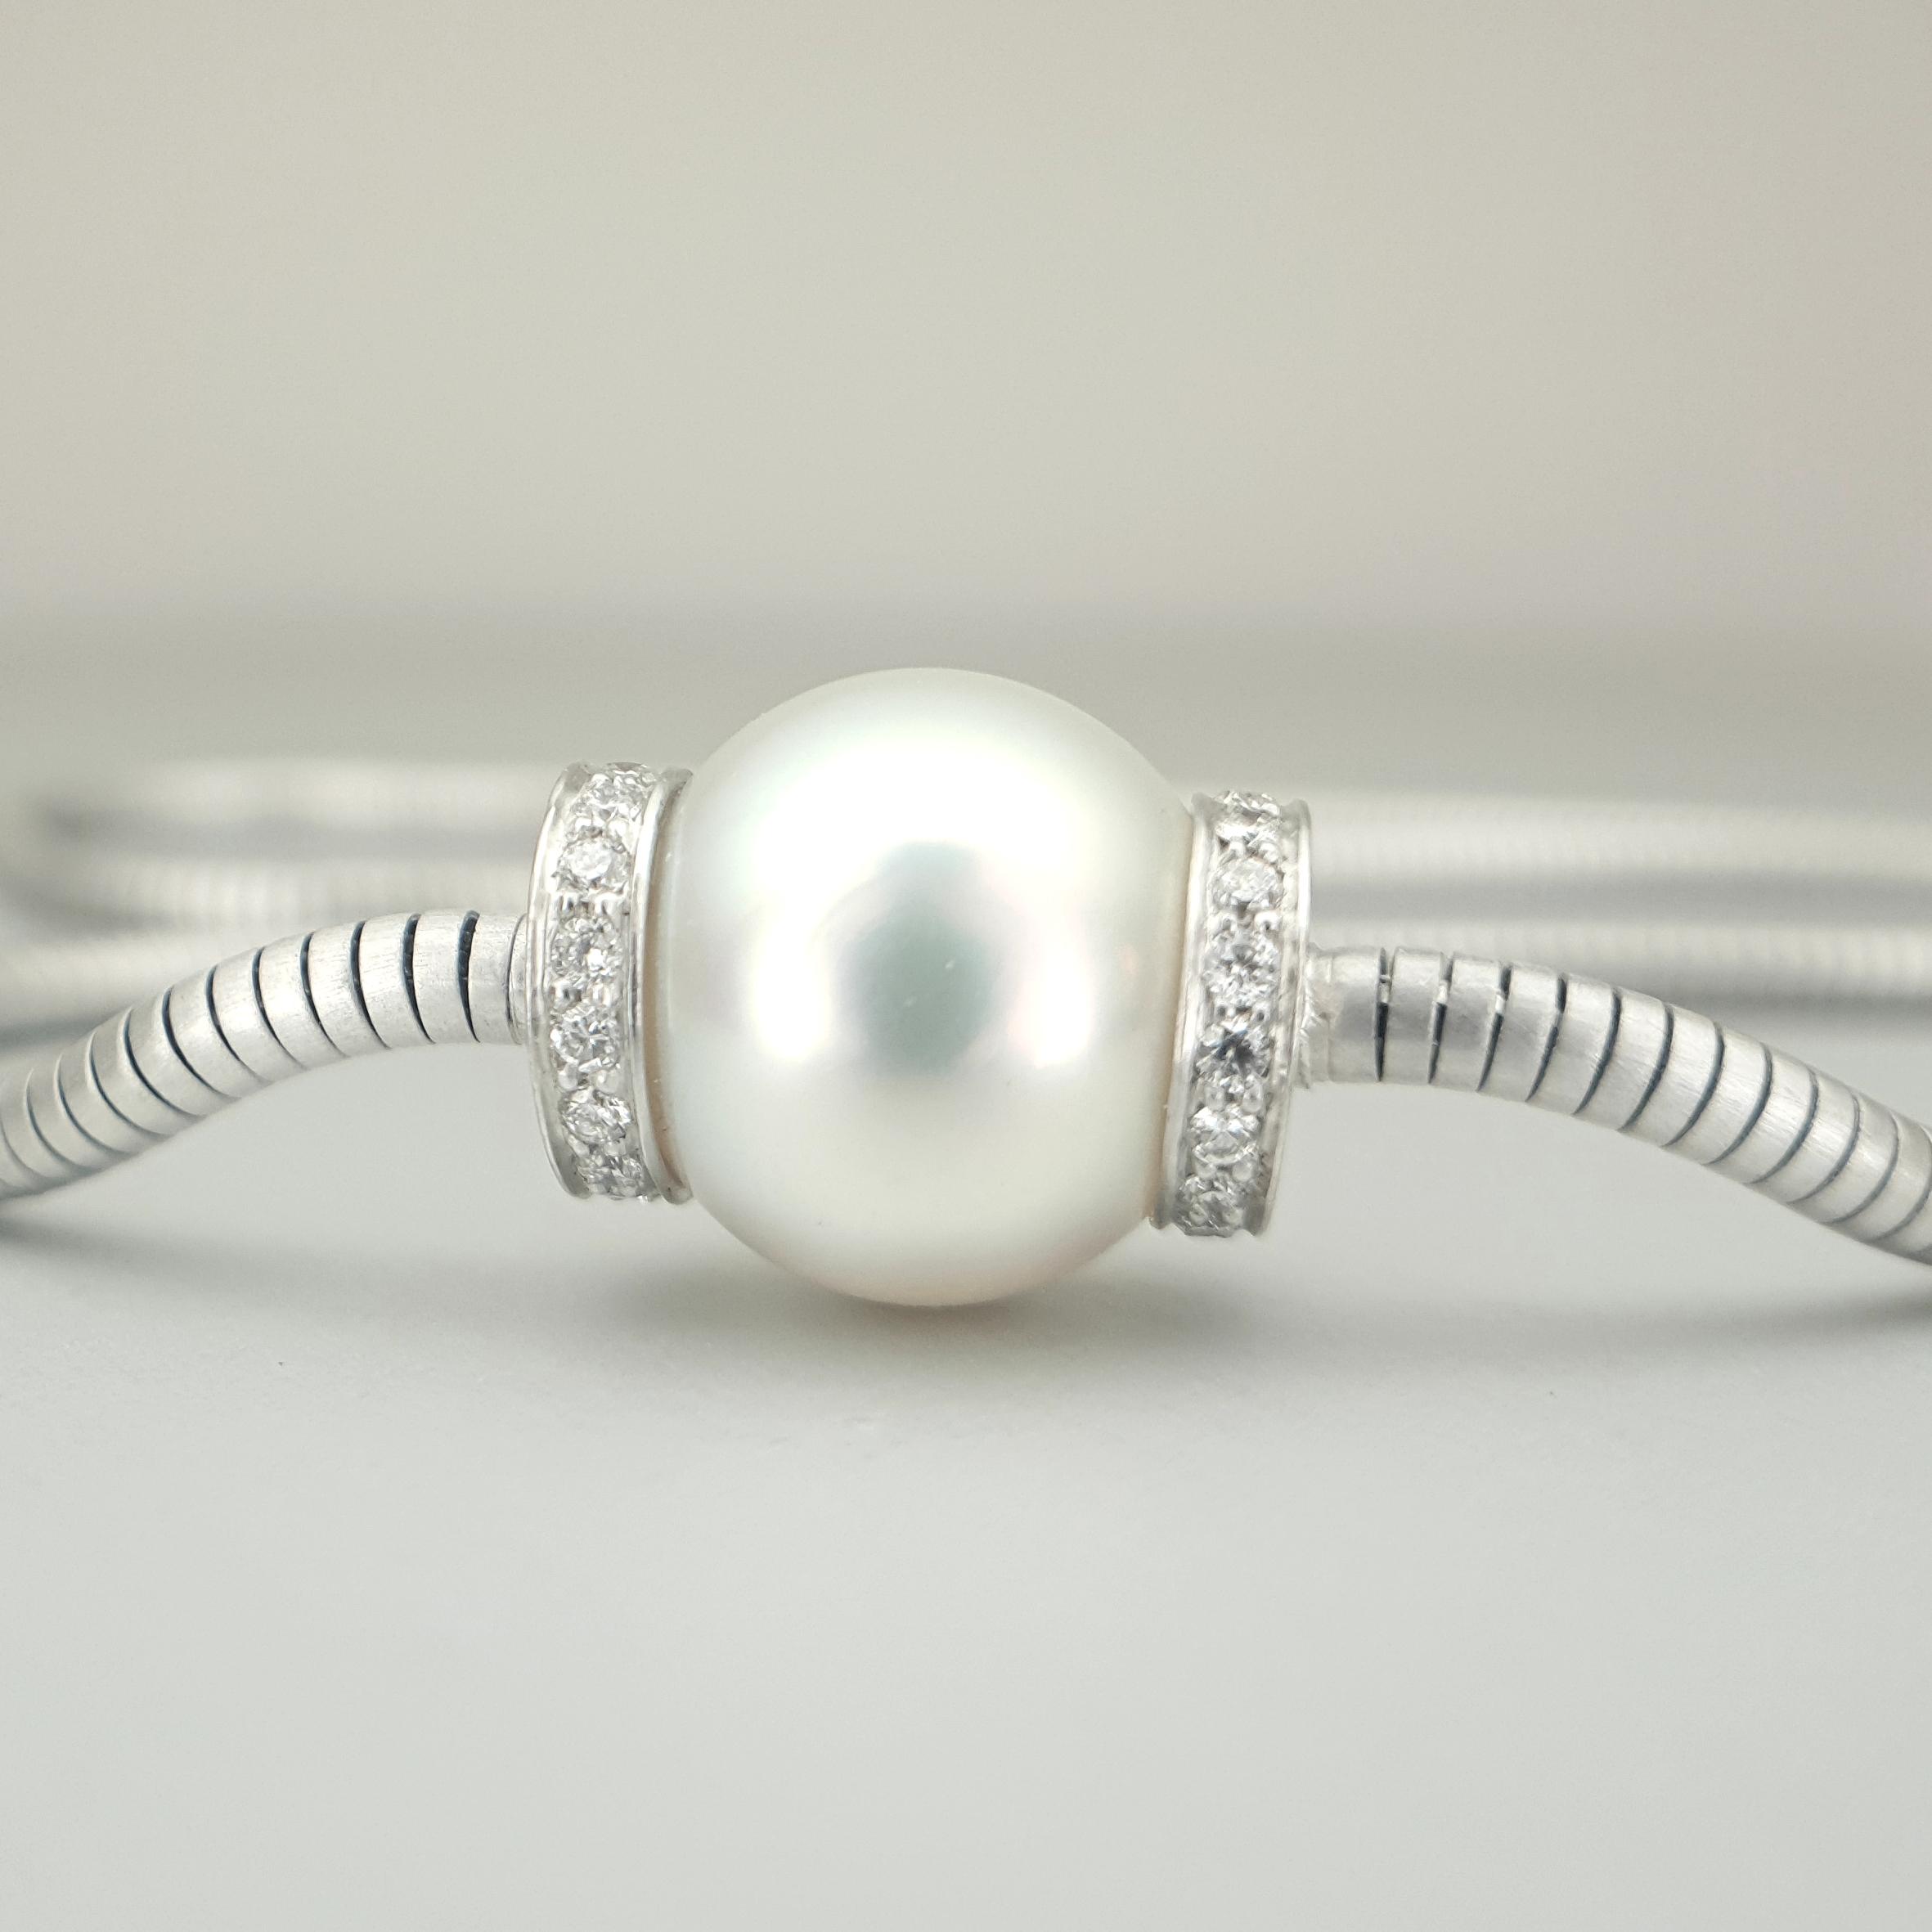 Cultured South Sea Pearl and Diamond 'Dorado' Pendant